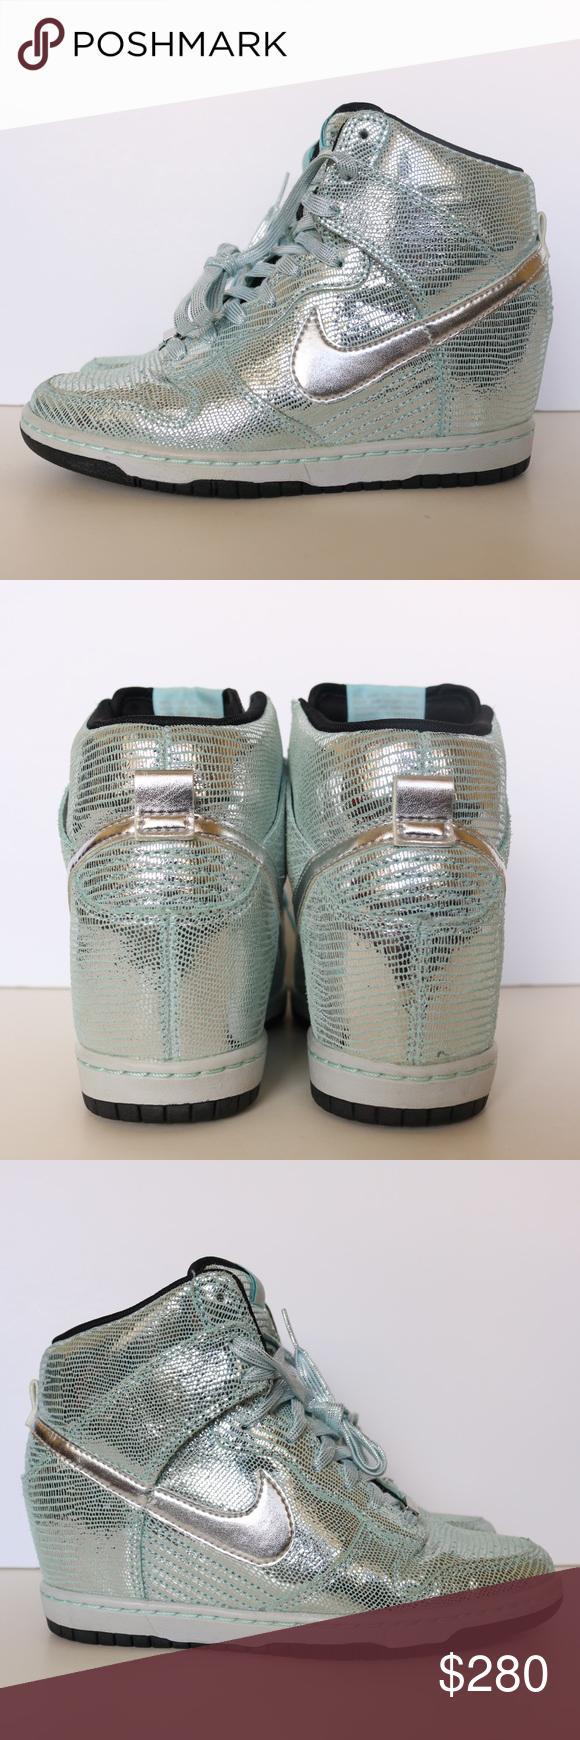 the latest d884d 7aa91 Nike dunk sky hi QS wedge disco ball silver shoes Nike dunk sky hi high qs  wedge Disco ball silver liquid metal Size 6 women 637991 001 Preowned Im ...